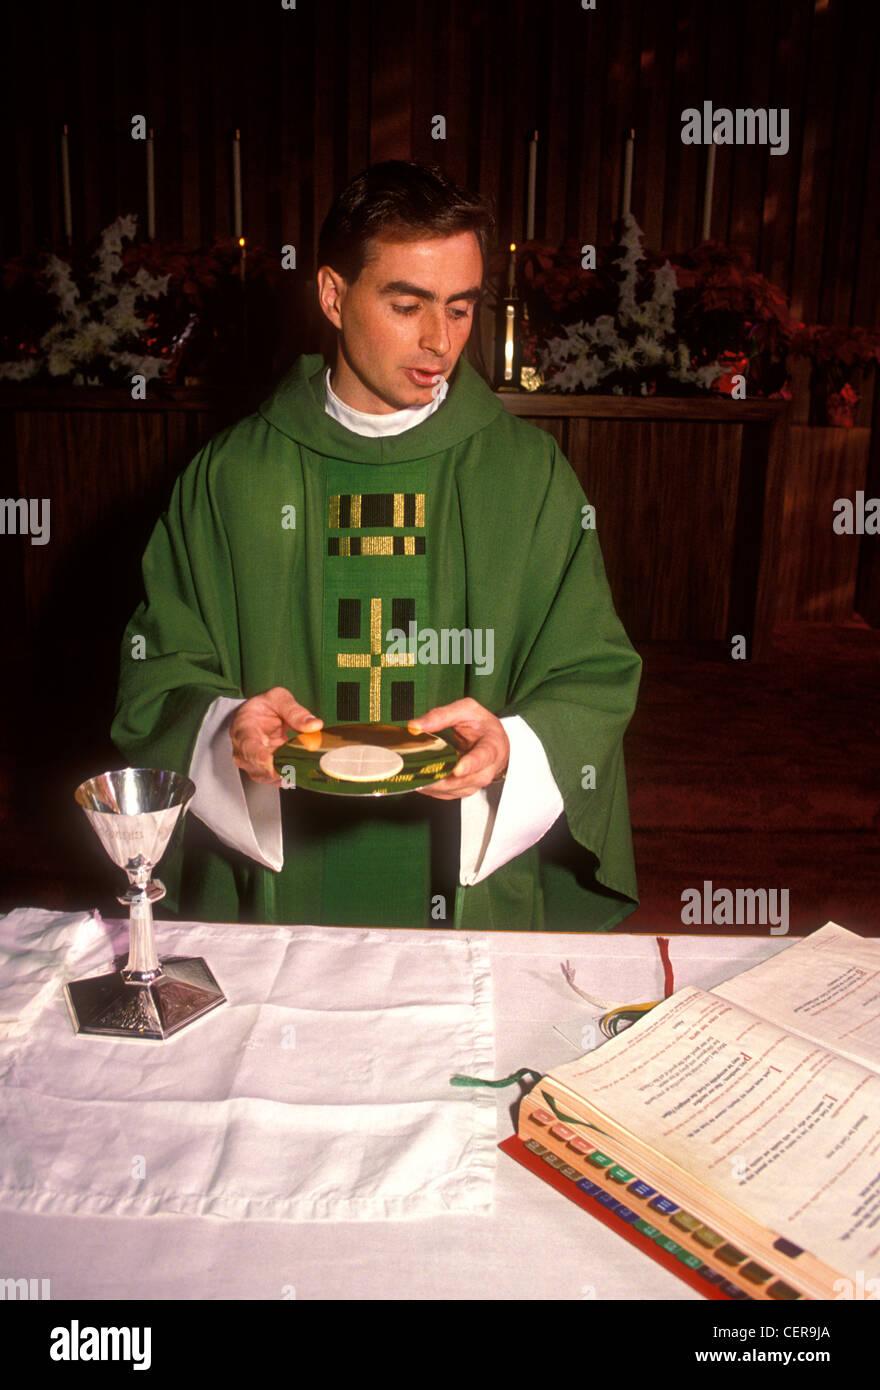 1, one, Roman Catholic priest, Catholic priest, preparation